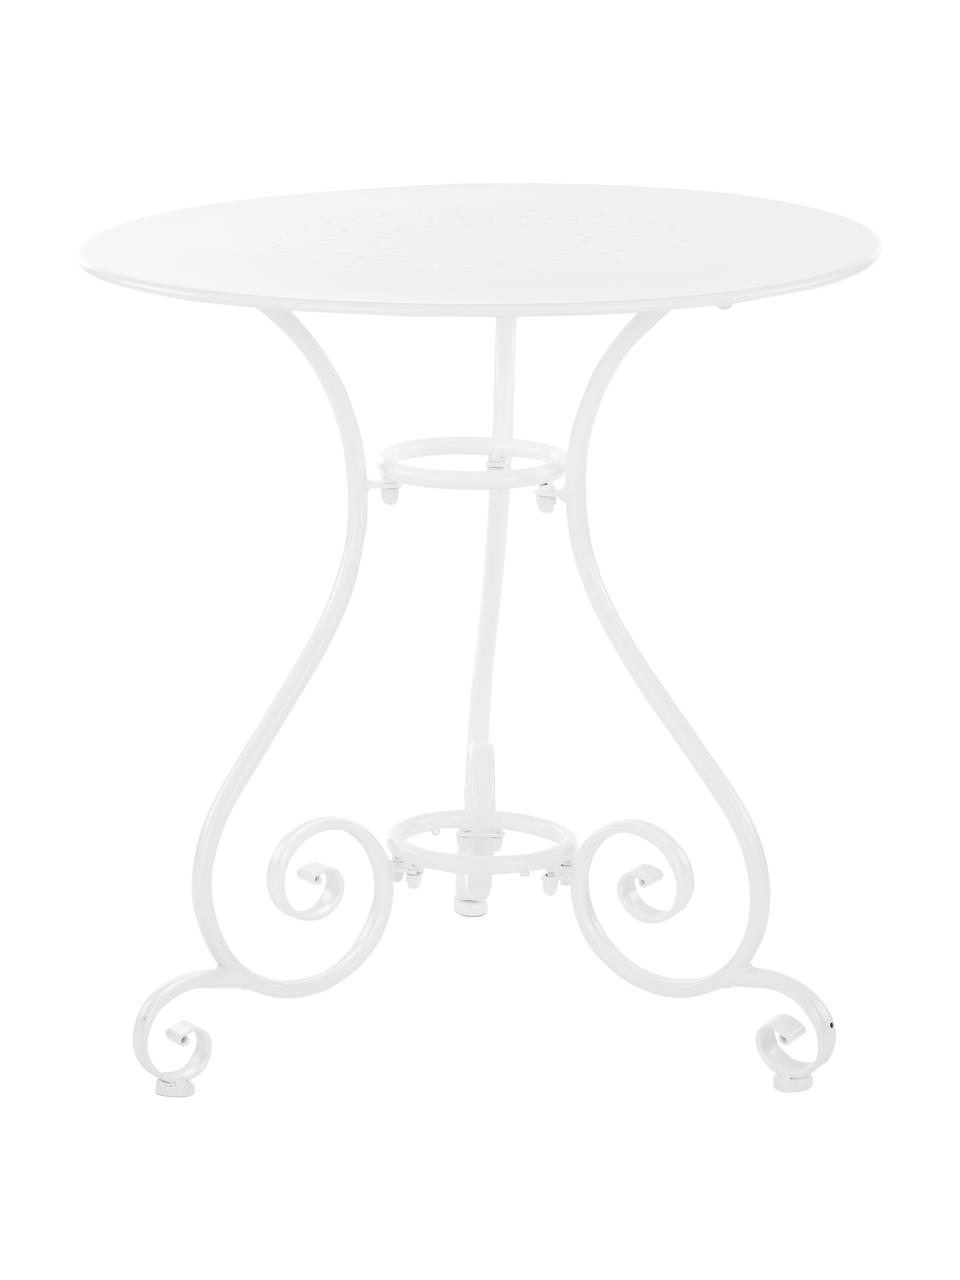 Table de jardin ronde en métal Etienne, Blanc